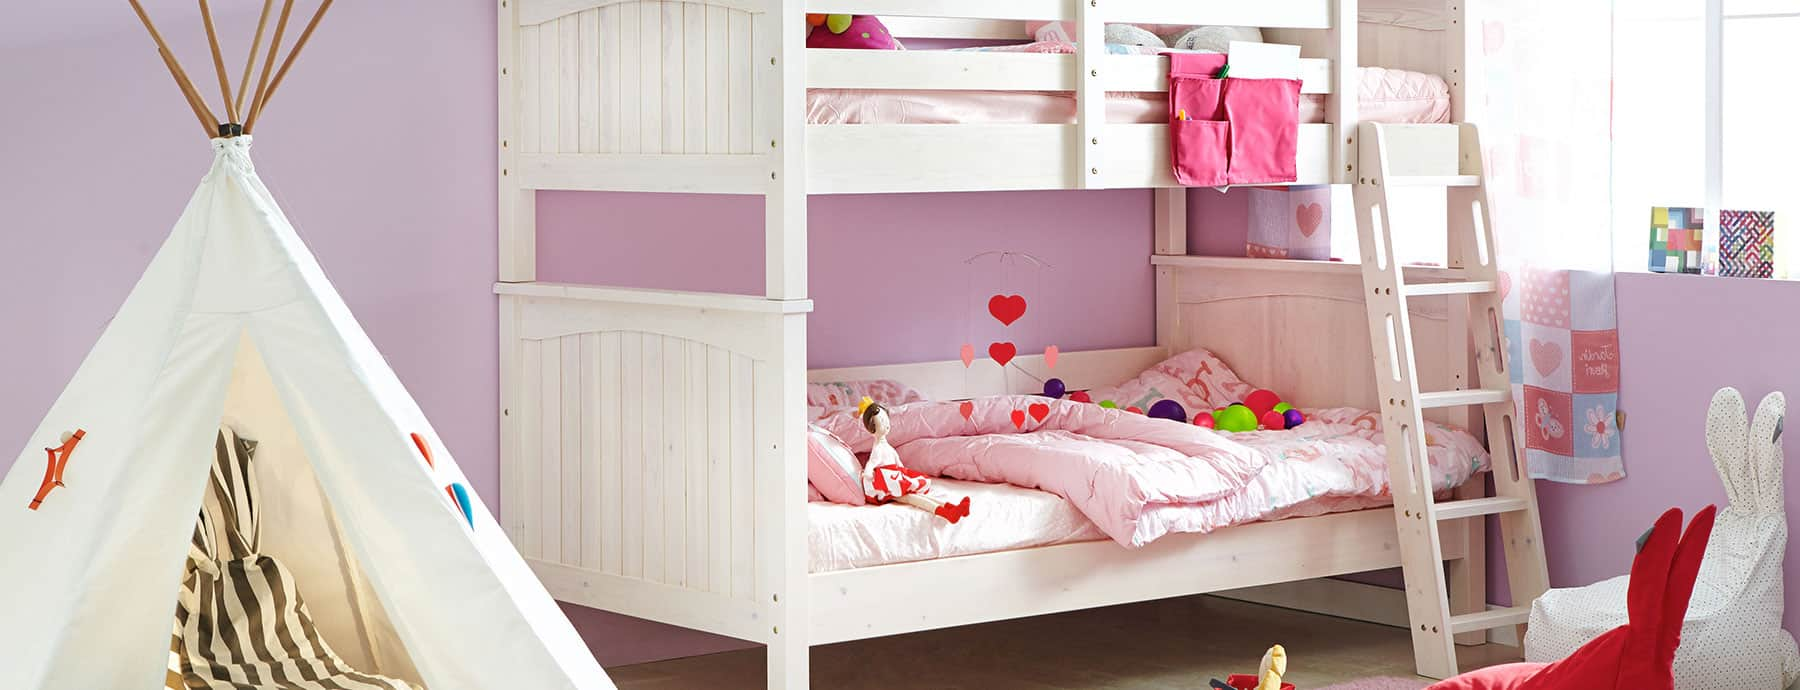 20 Short Bunk Beds For Small Rooms Nursery Kid S Room Decor Ideas My Sleepy Monkey